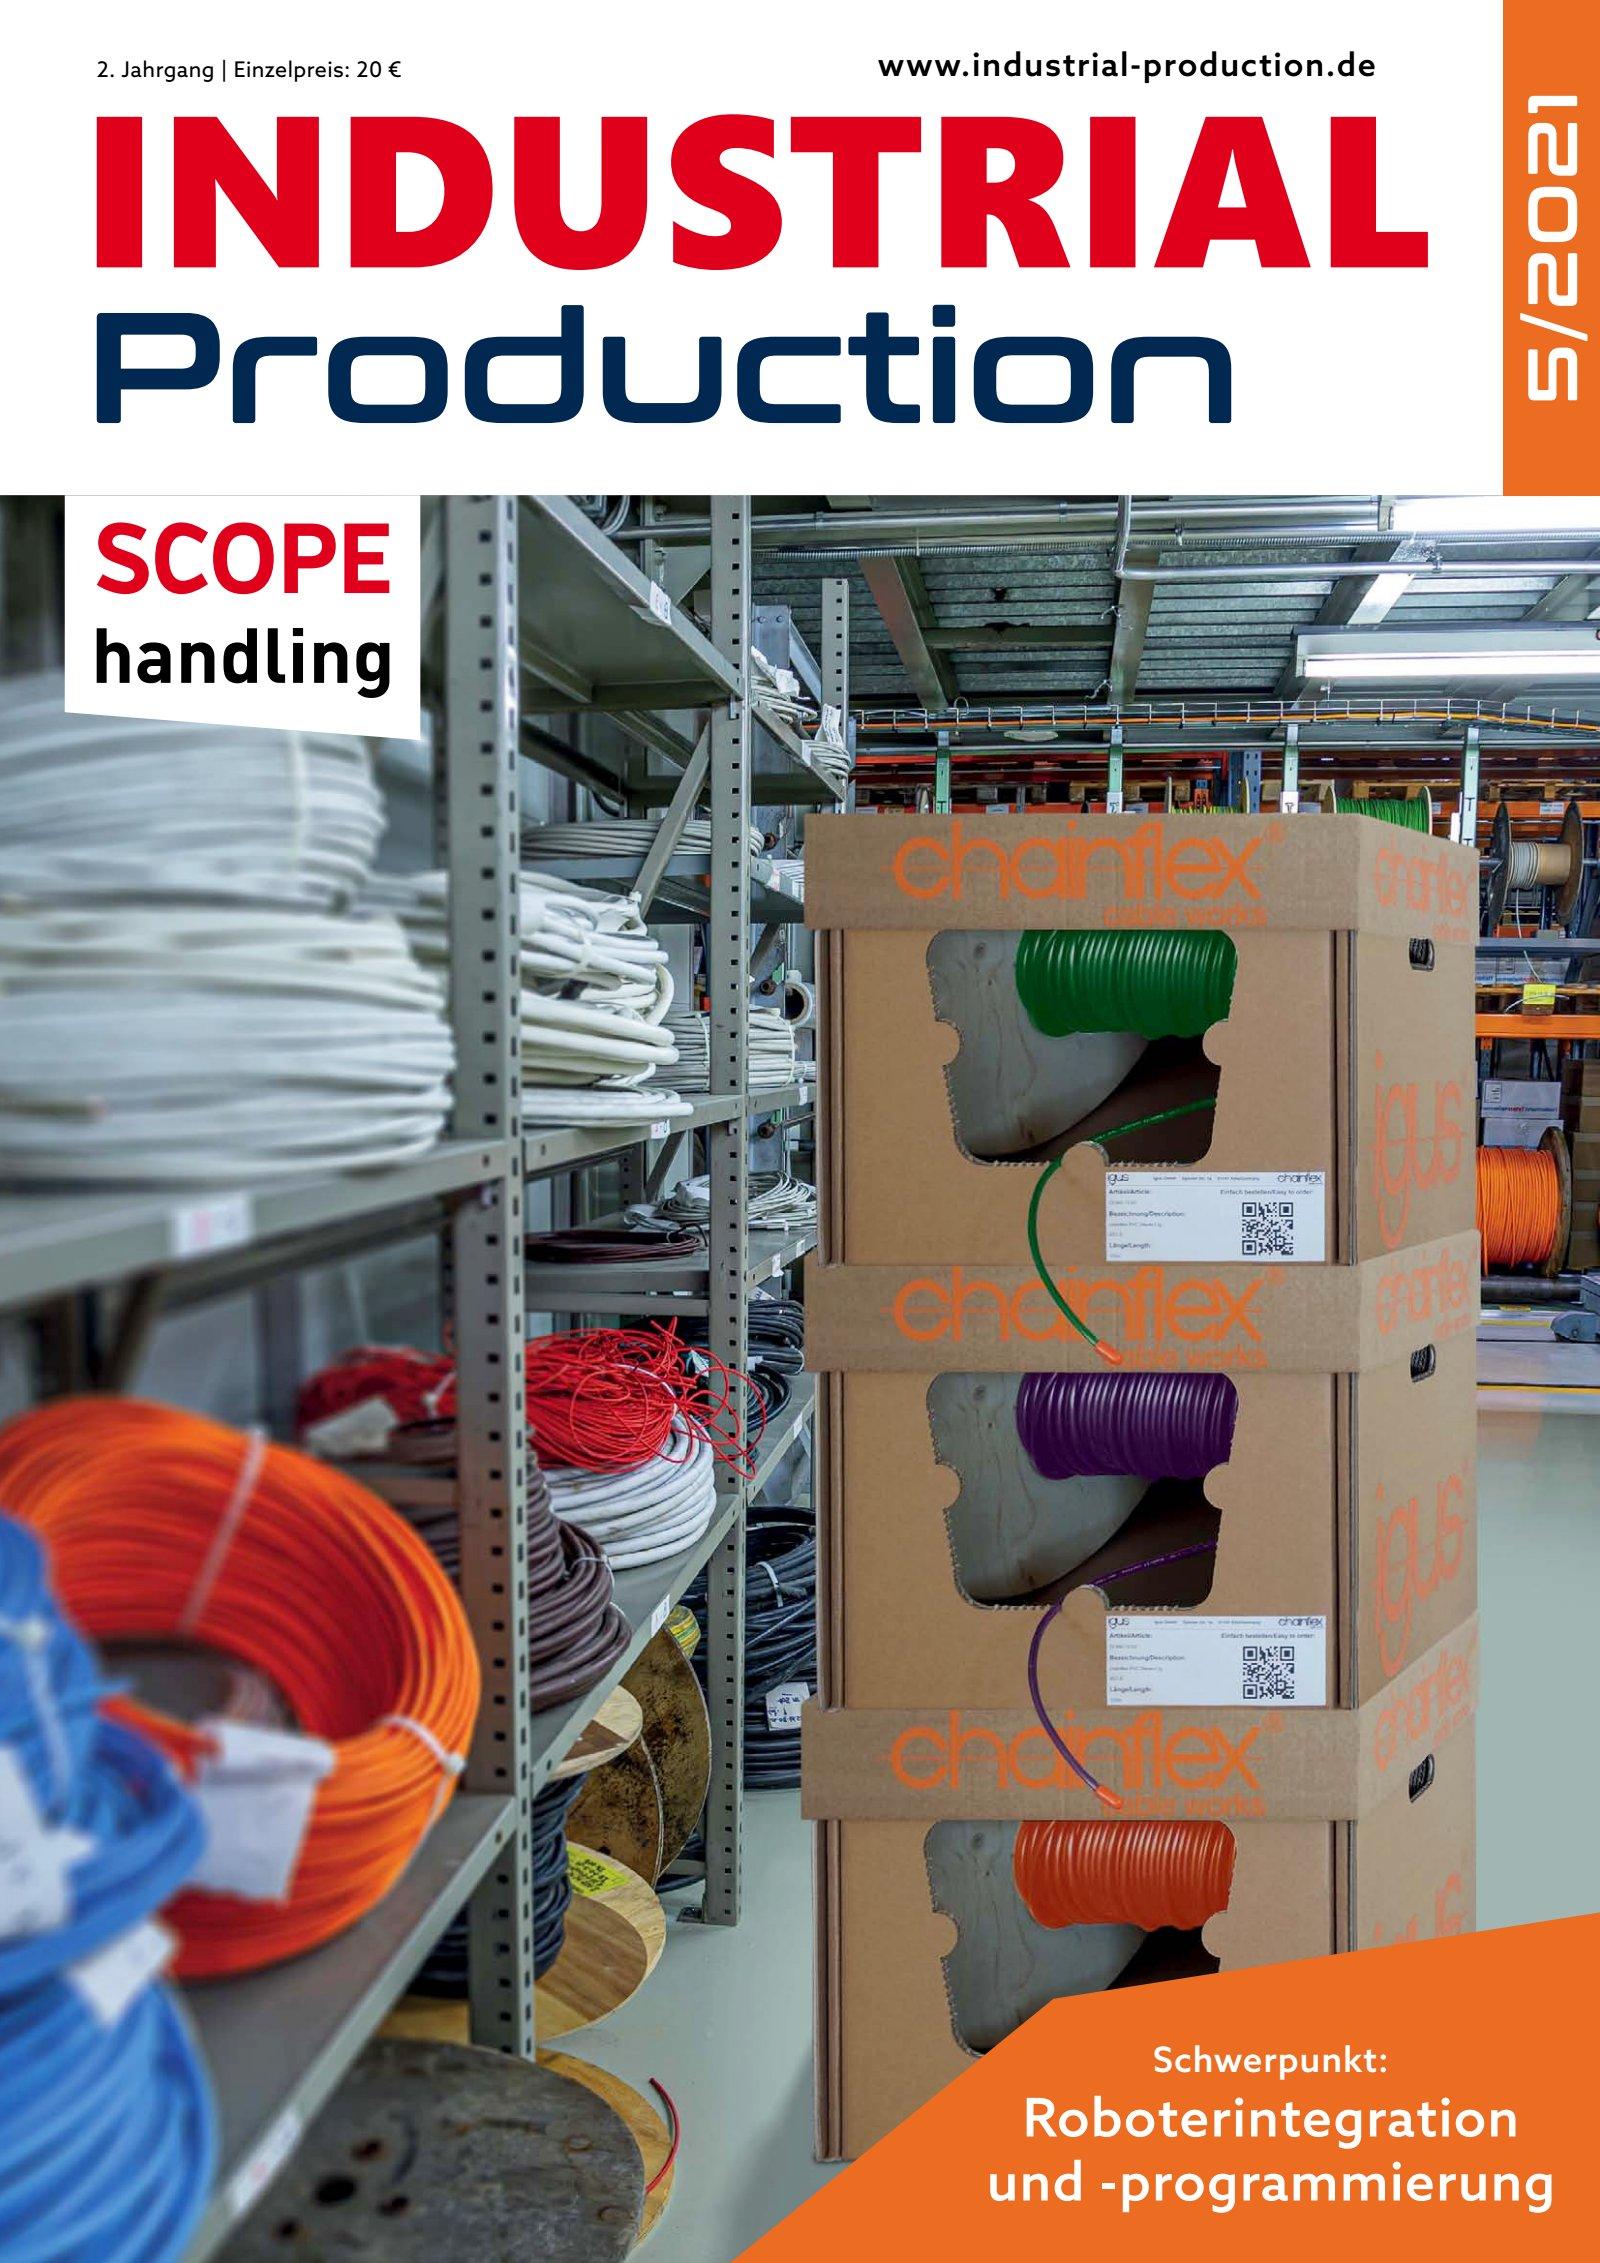 INDUSTRIAL Production 05/2021 Digital